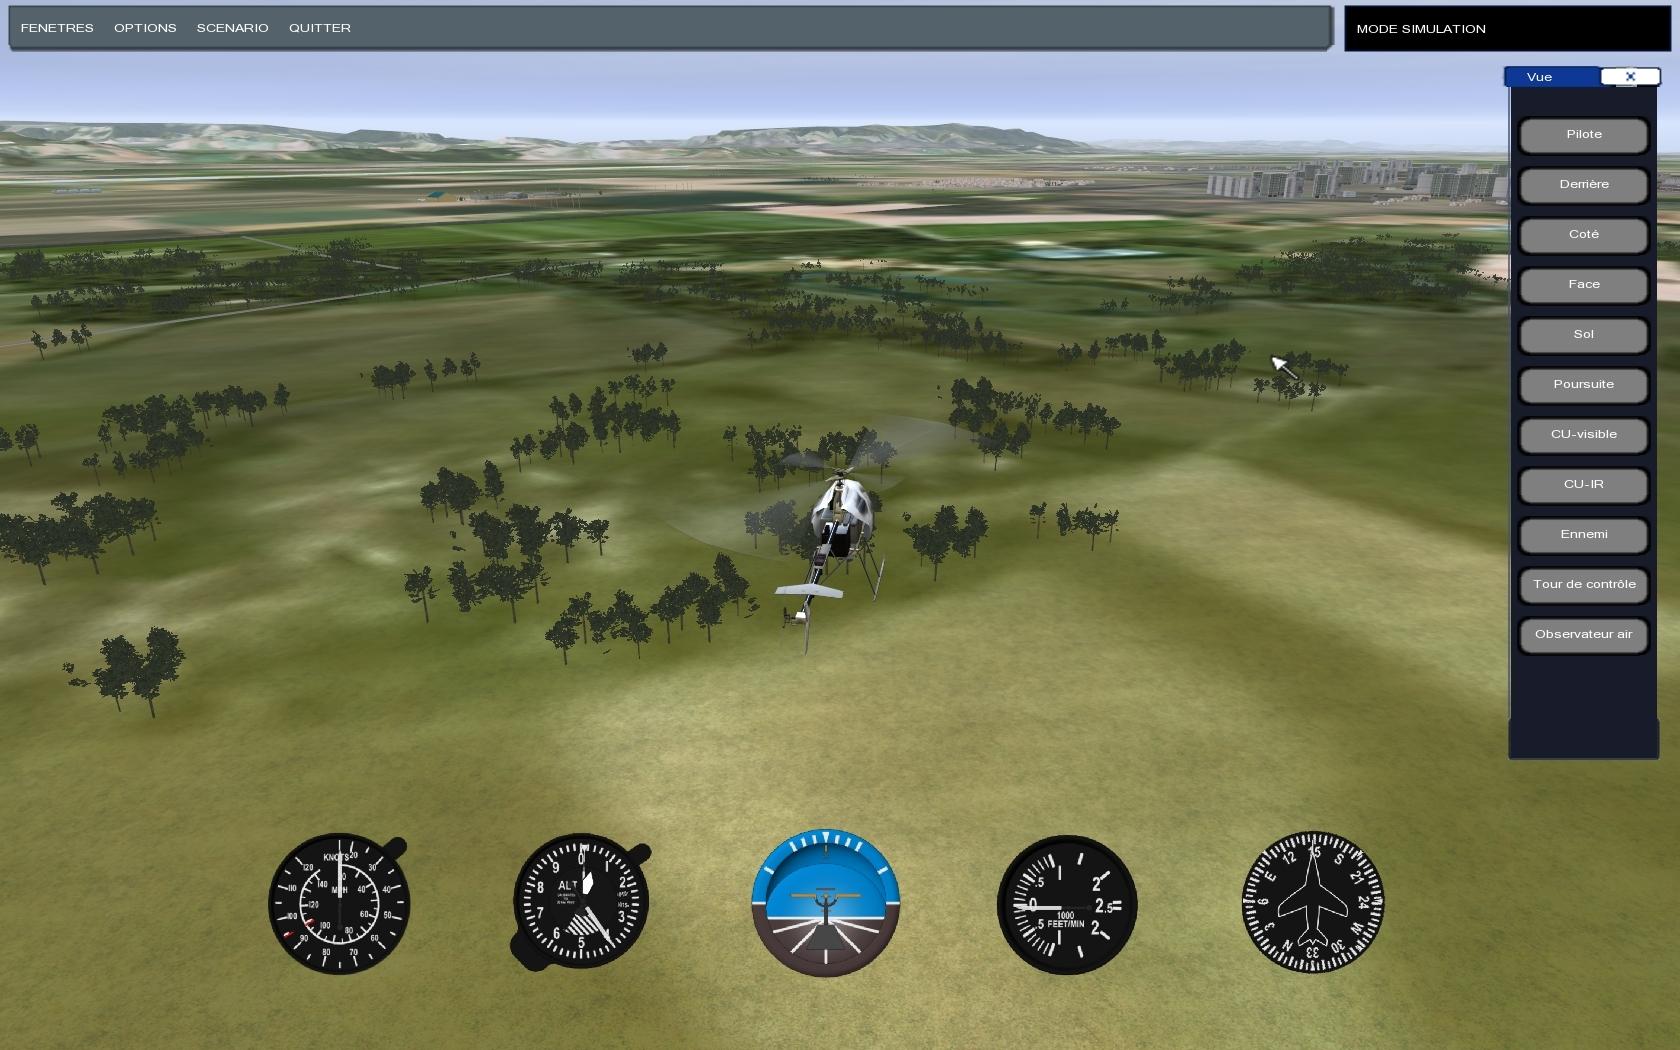 Simdrone UAV simulator by H-SIM